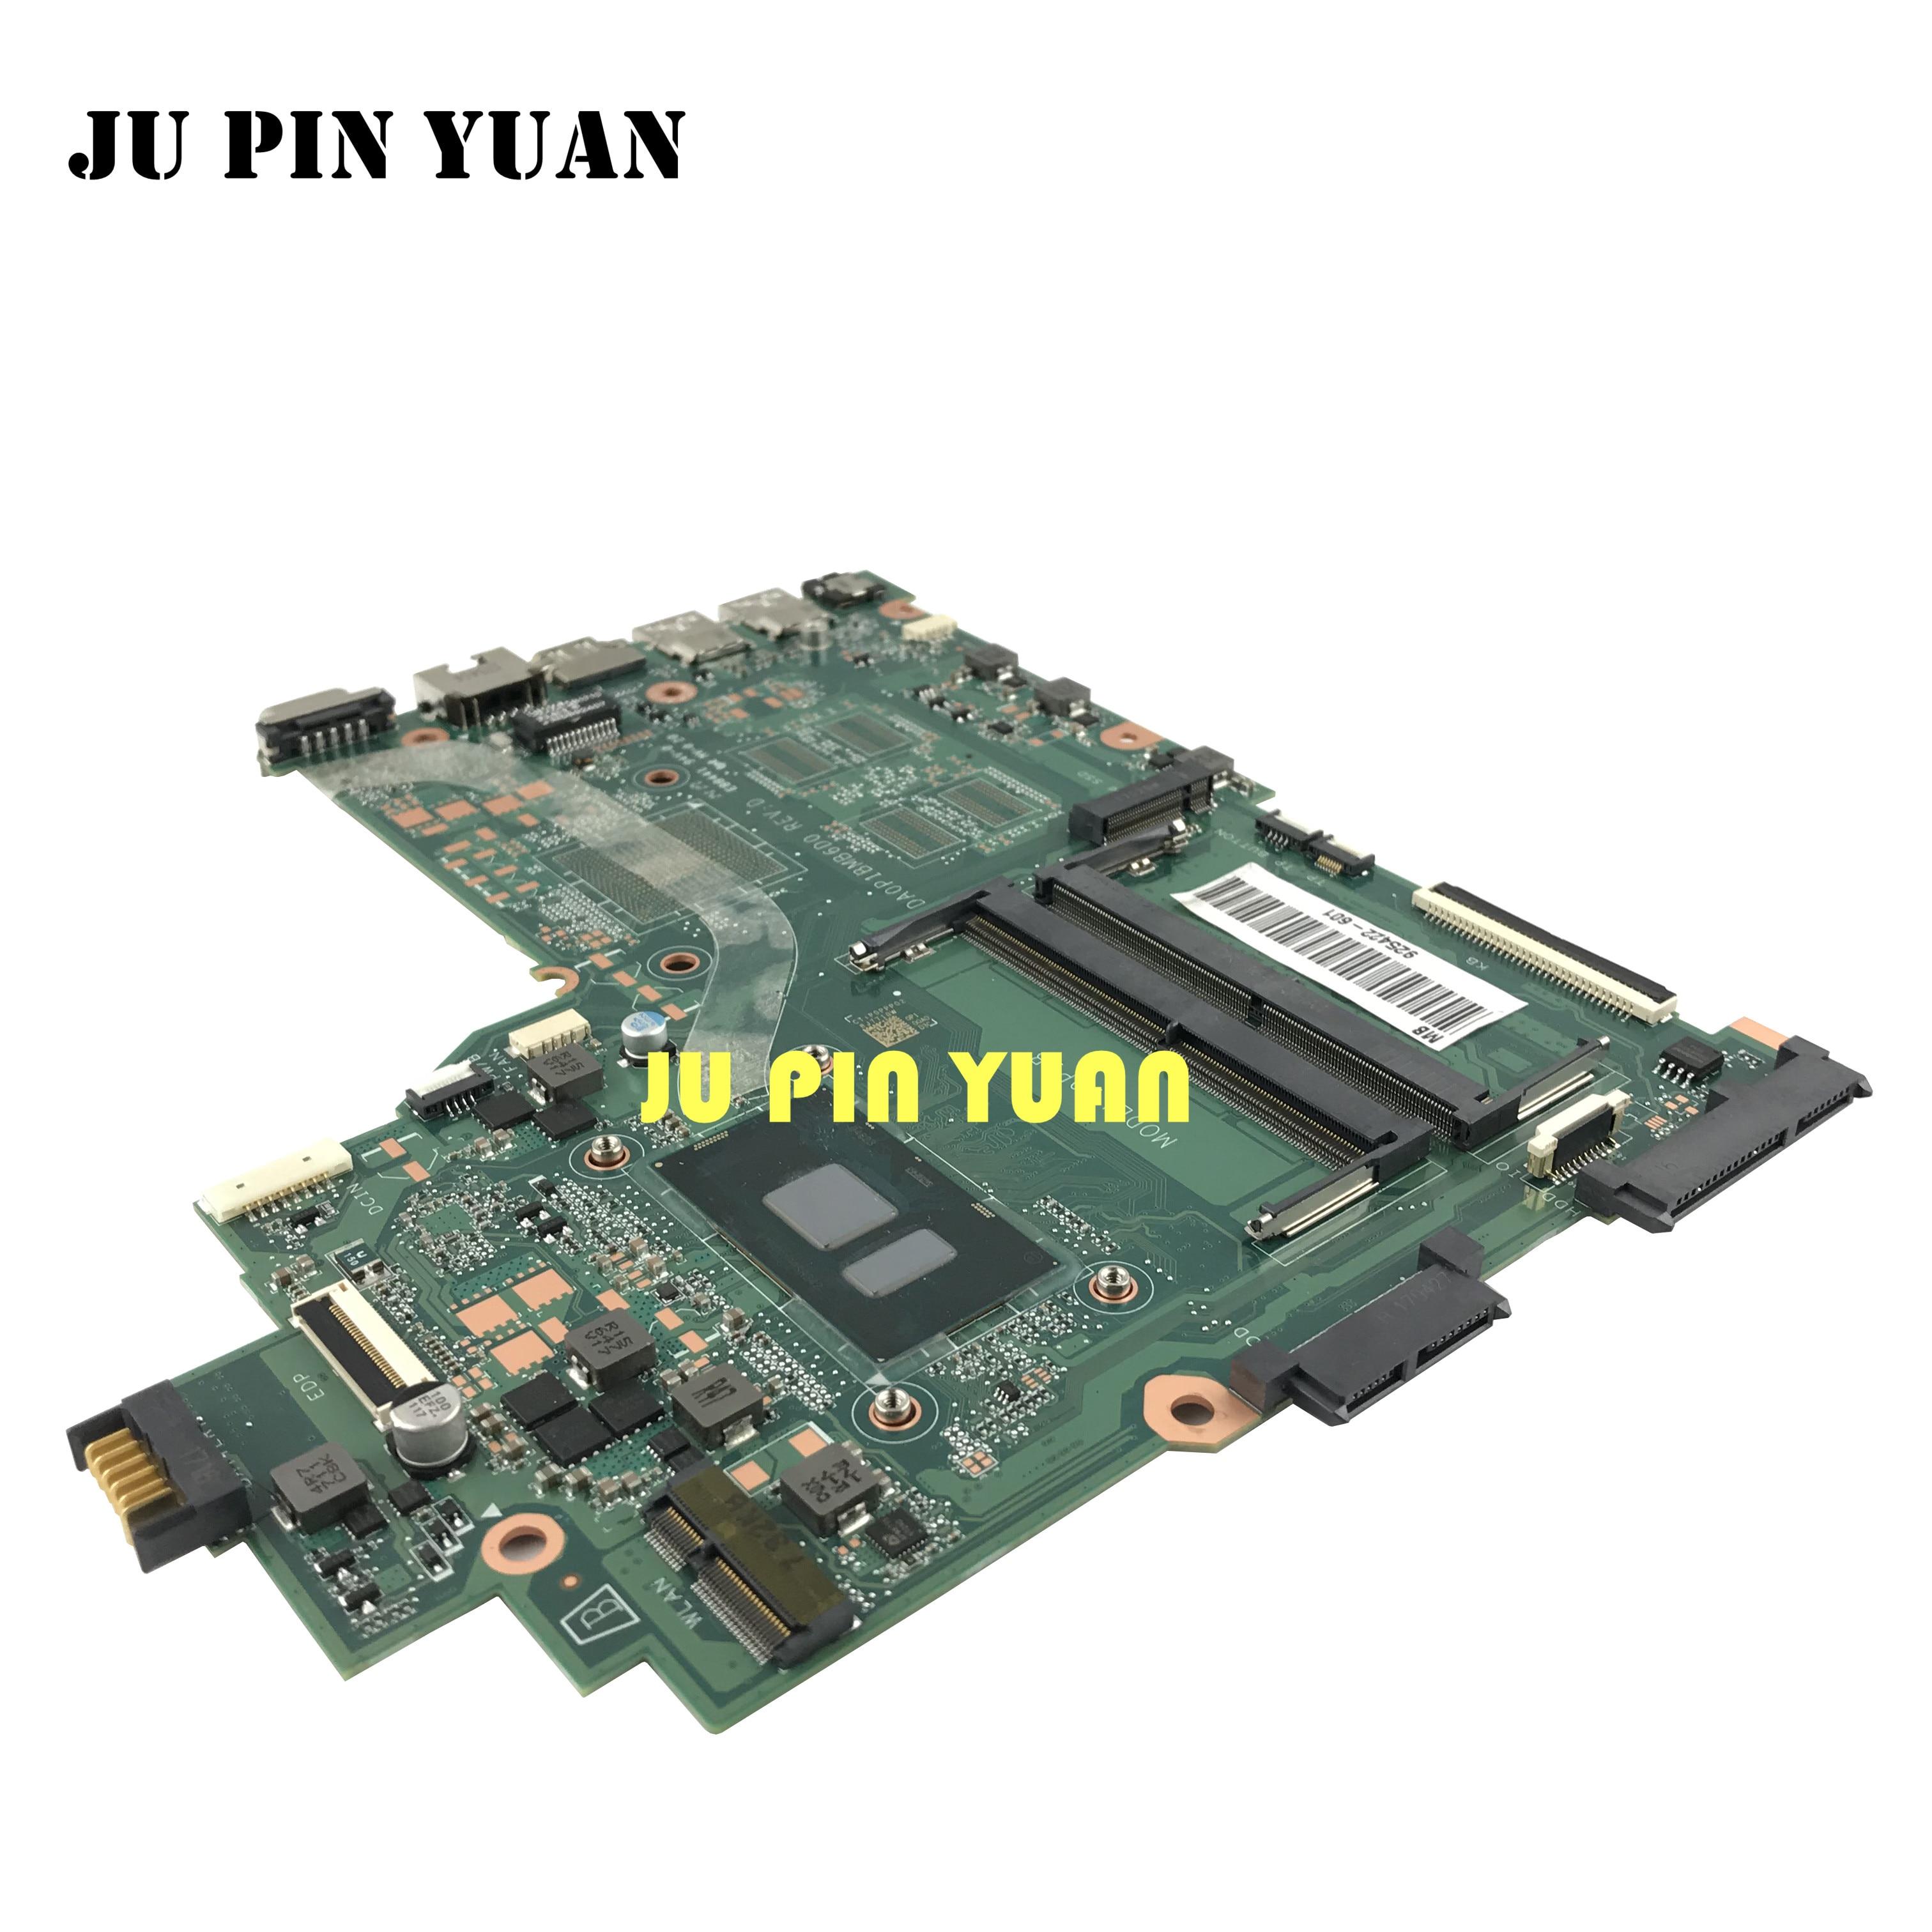 925422-601 925422-001 DA0P1BMB6D0 para HP 240 G6 14-BS series motherboard con i5-7200U CPU completamente probado